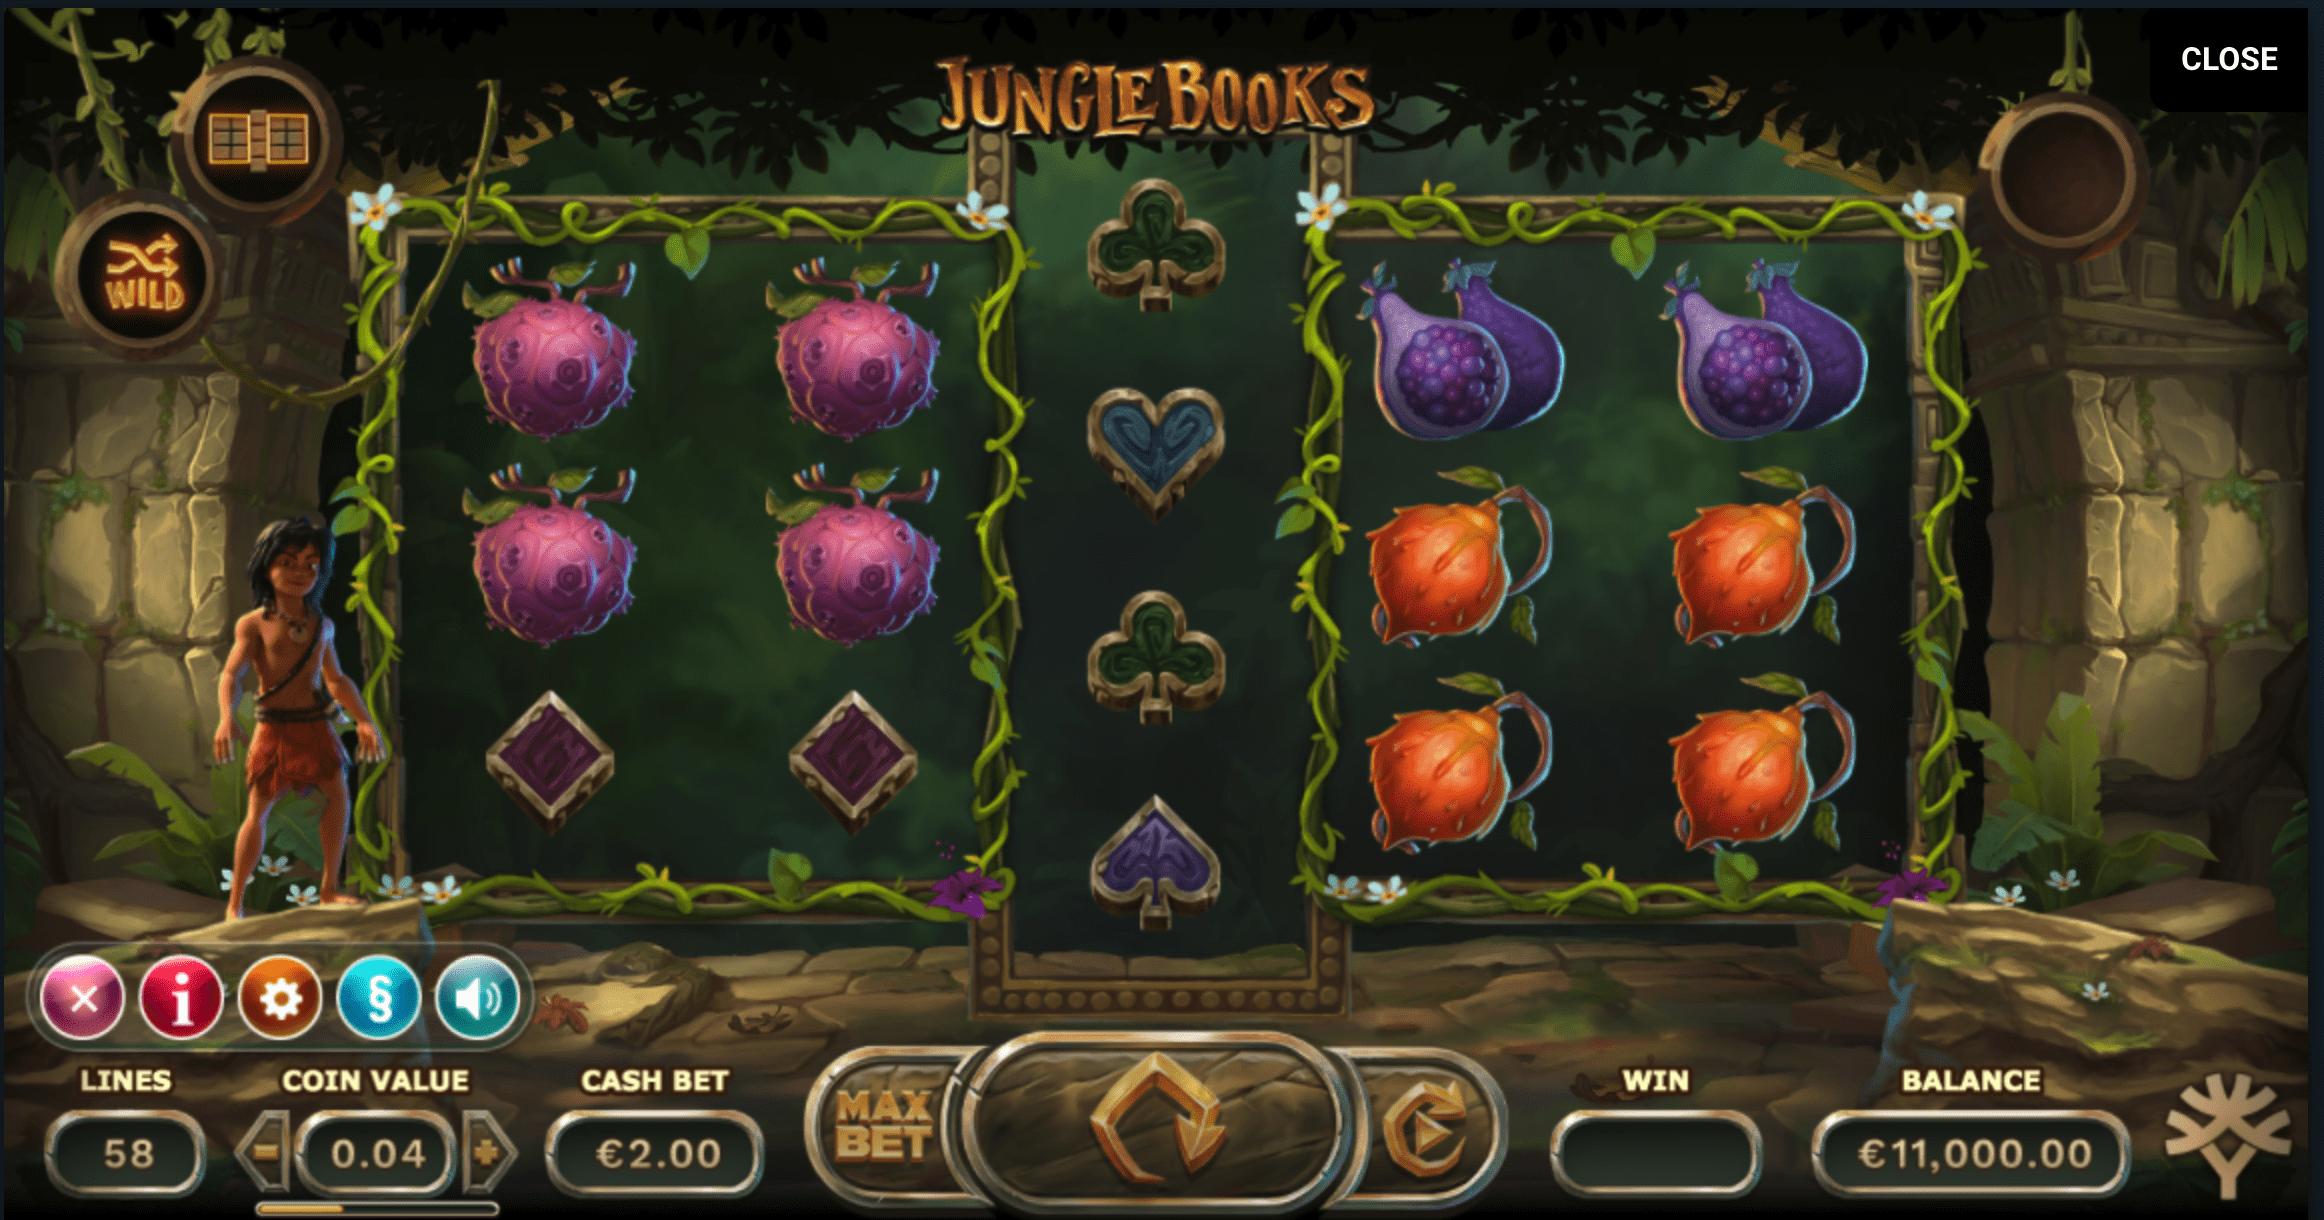 Jungle Books Spielautomat